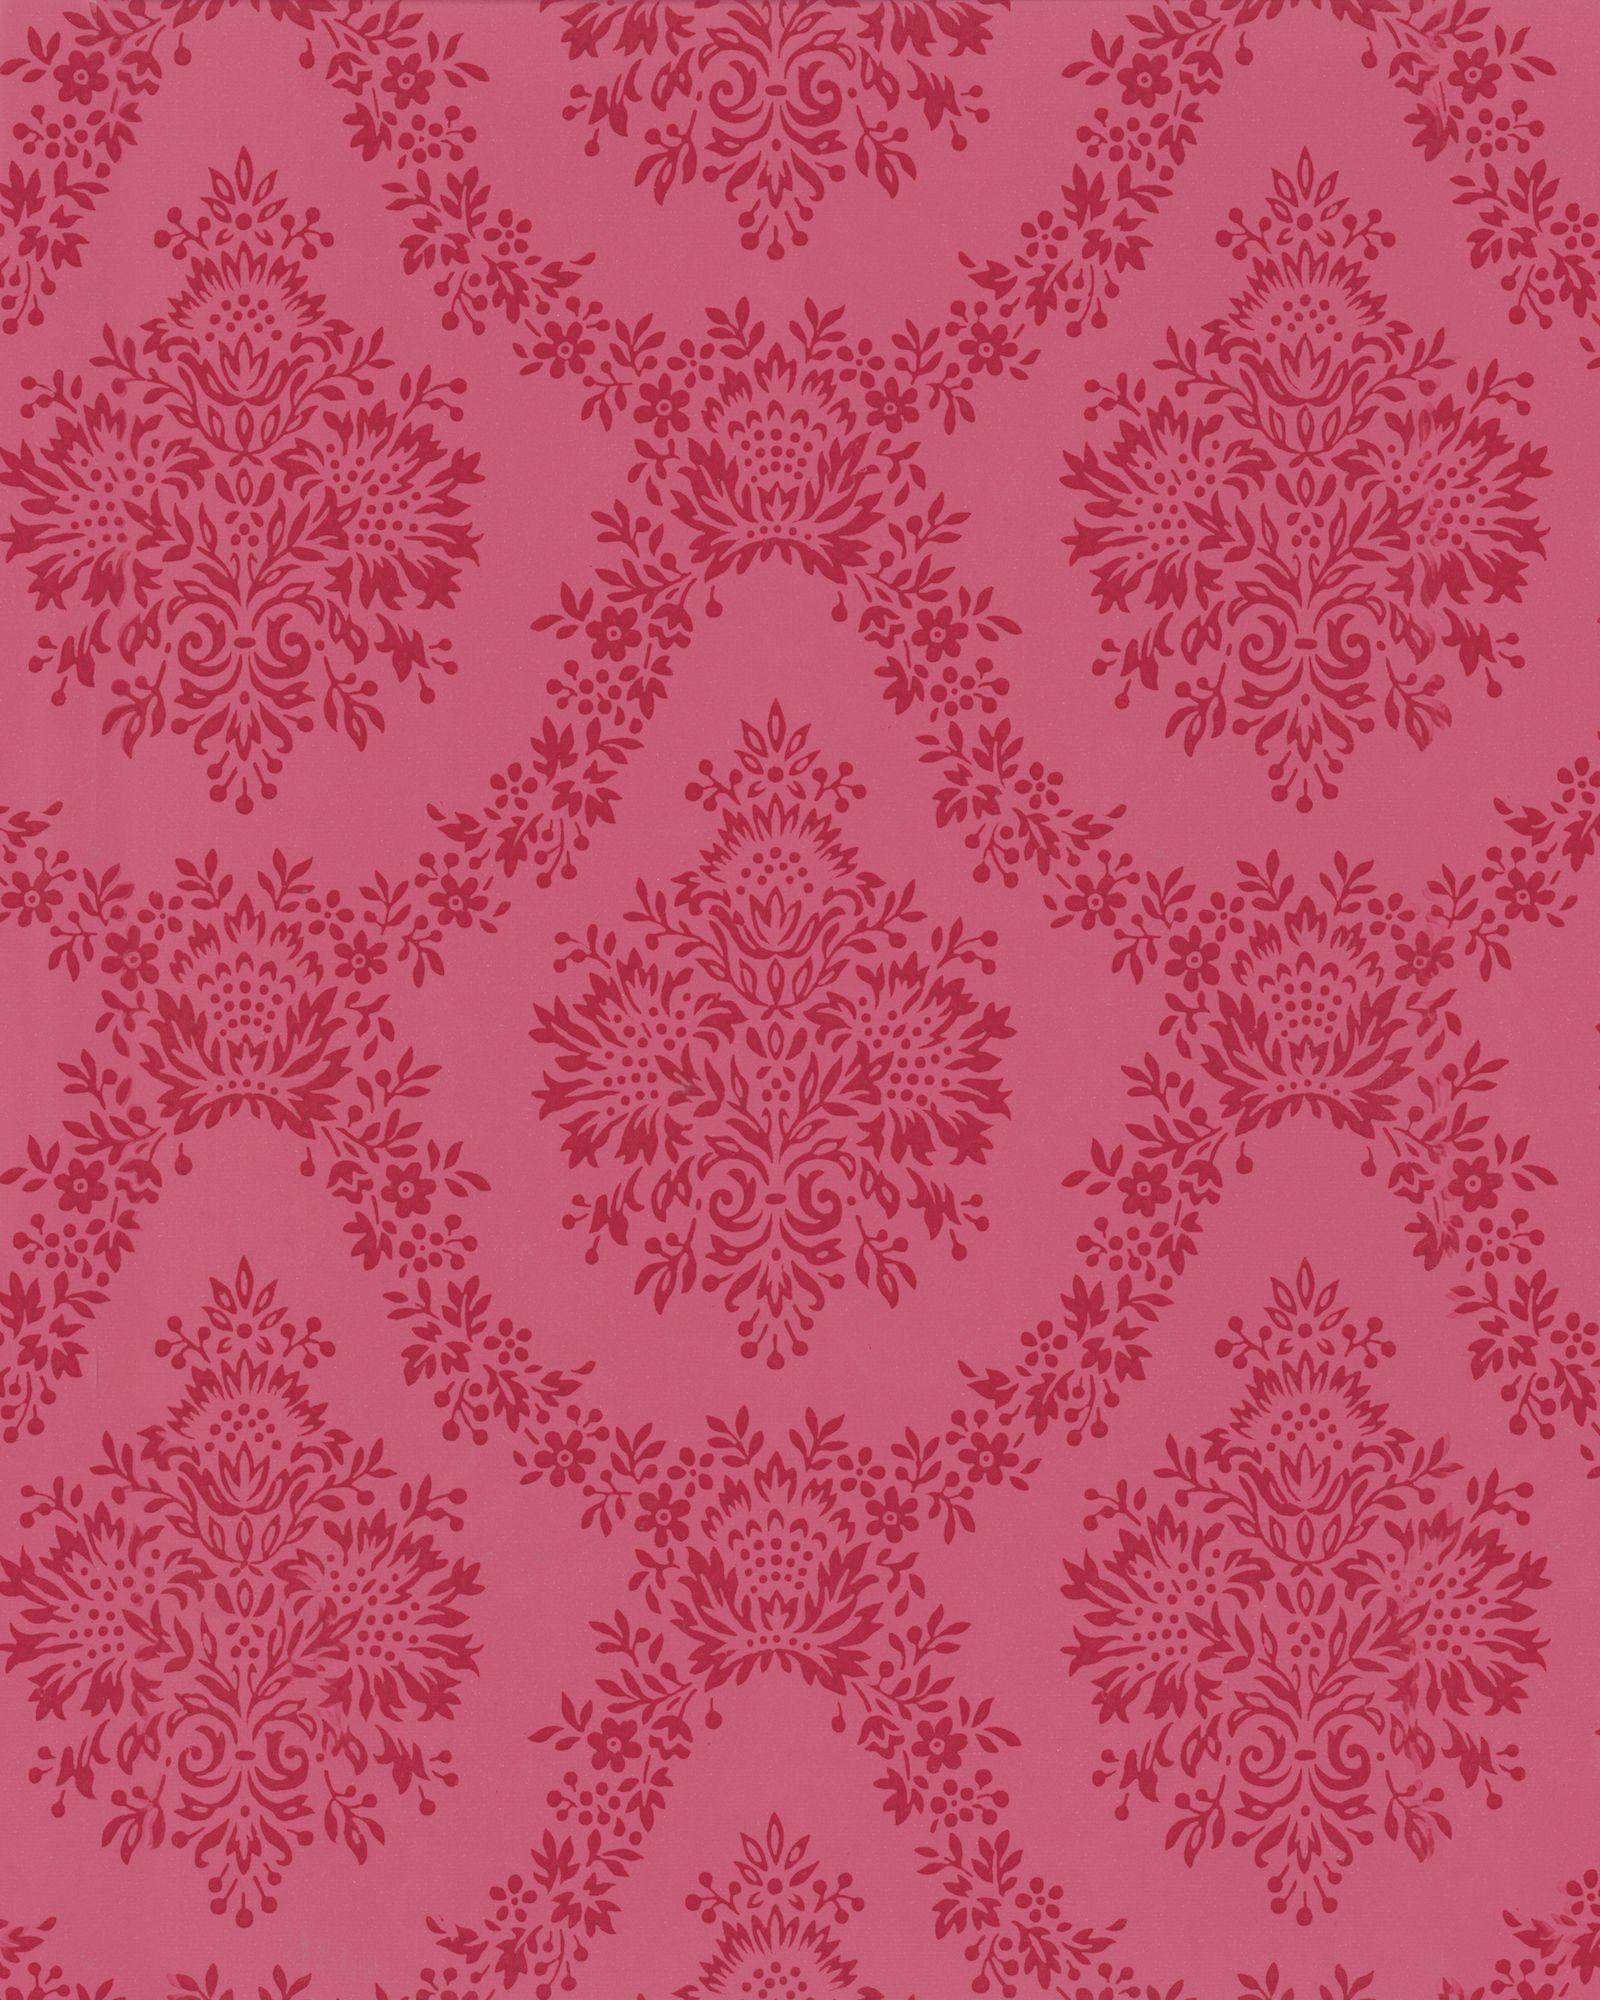 Popular Wallpaper Marble Hot Pink - home-trends-damask-wallpaper-1490208380  Image_42398.jpg